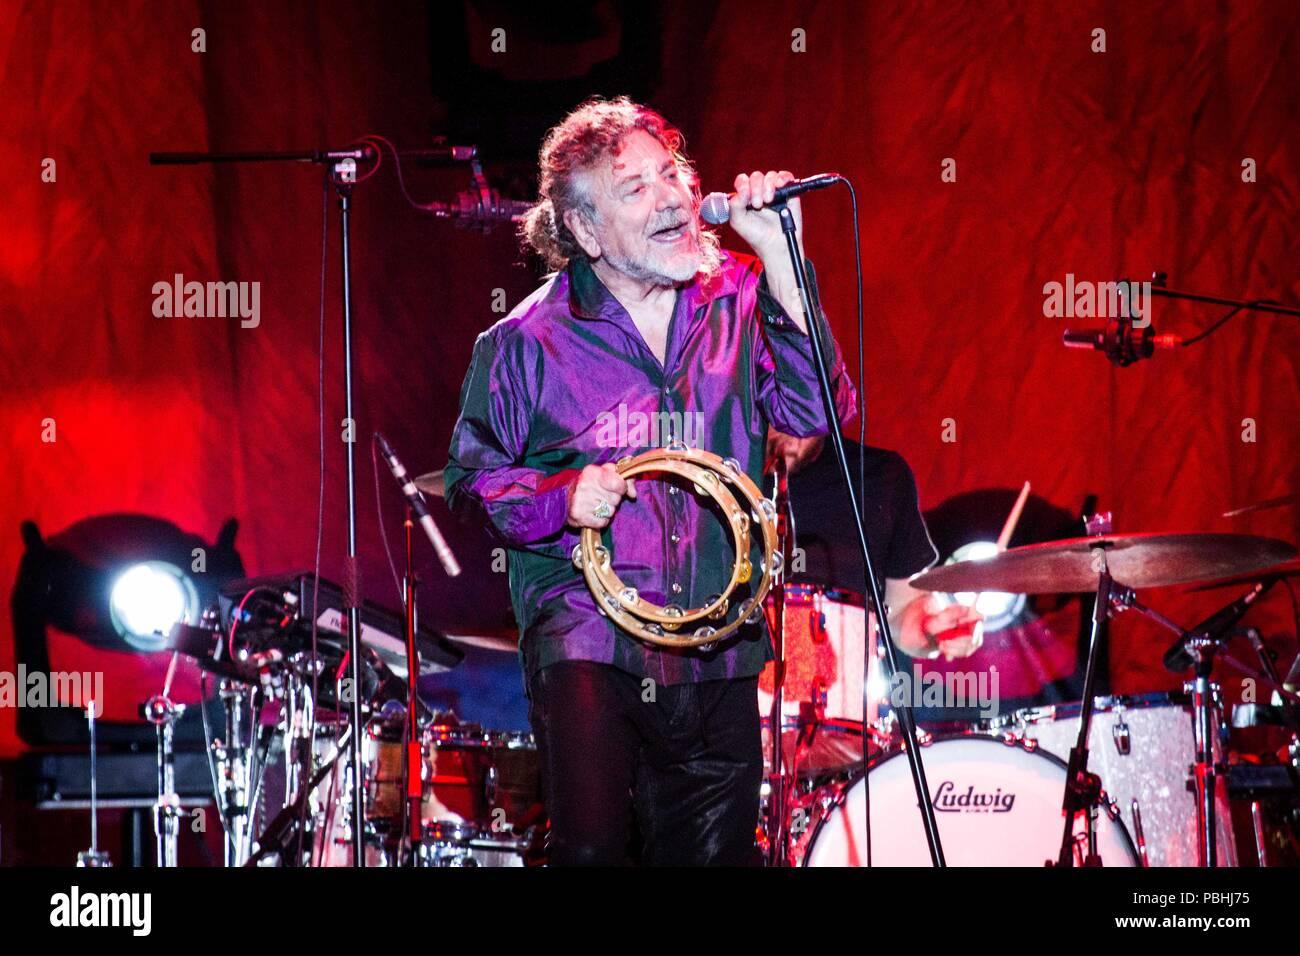 Milan Italy 27 july 2018 Robert Plant & The Sensational Space Shifters  live at Milano Summer Festival 2018 at Ippodromo San Siro © Roberto Finizio /  - Stock Image